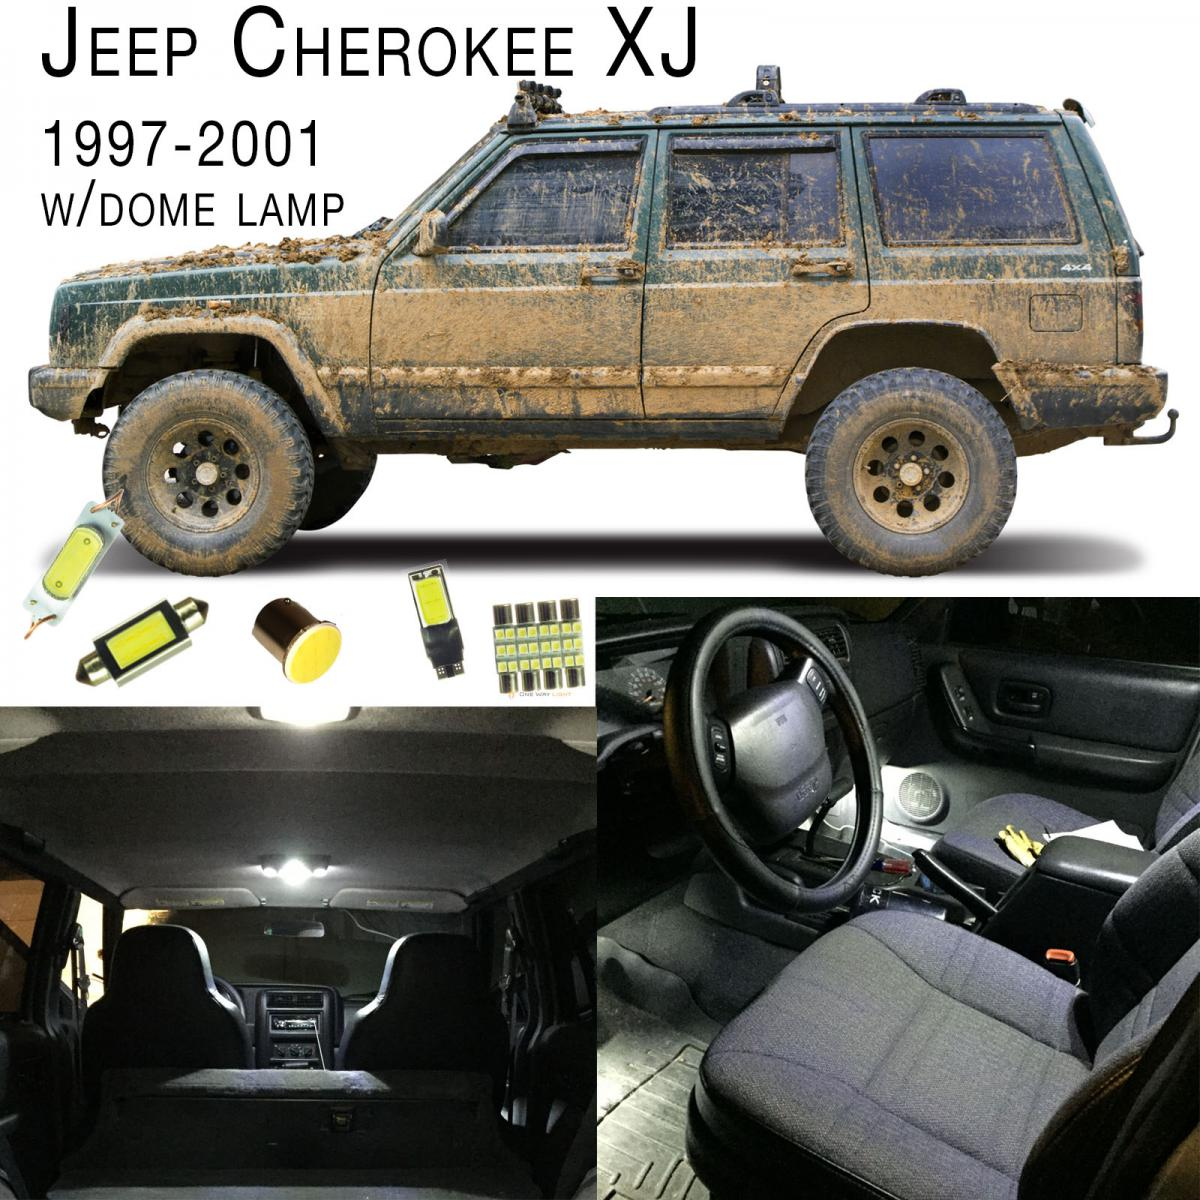 1997 2001 jeep cherokee xj led interior led set white w. Black Bedroom Furniture Sets. Home Design Ideas